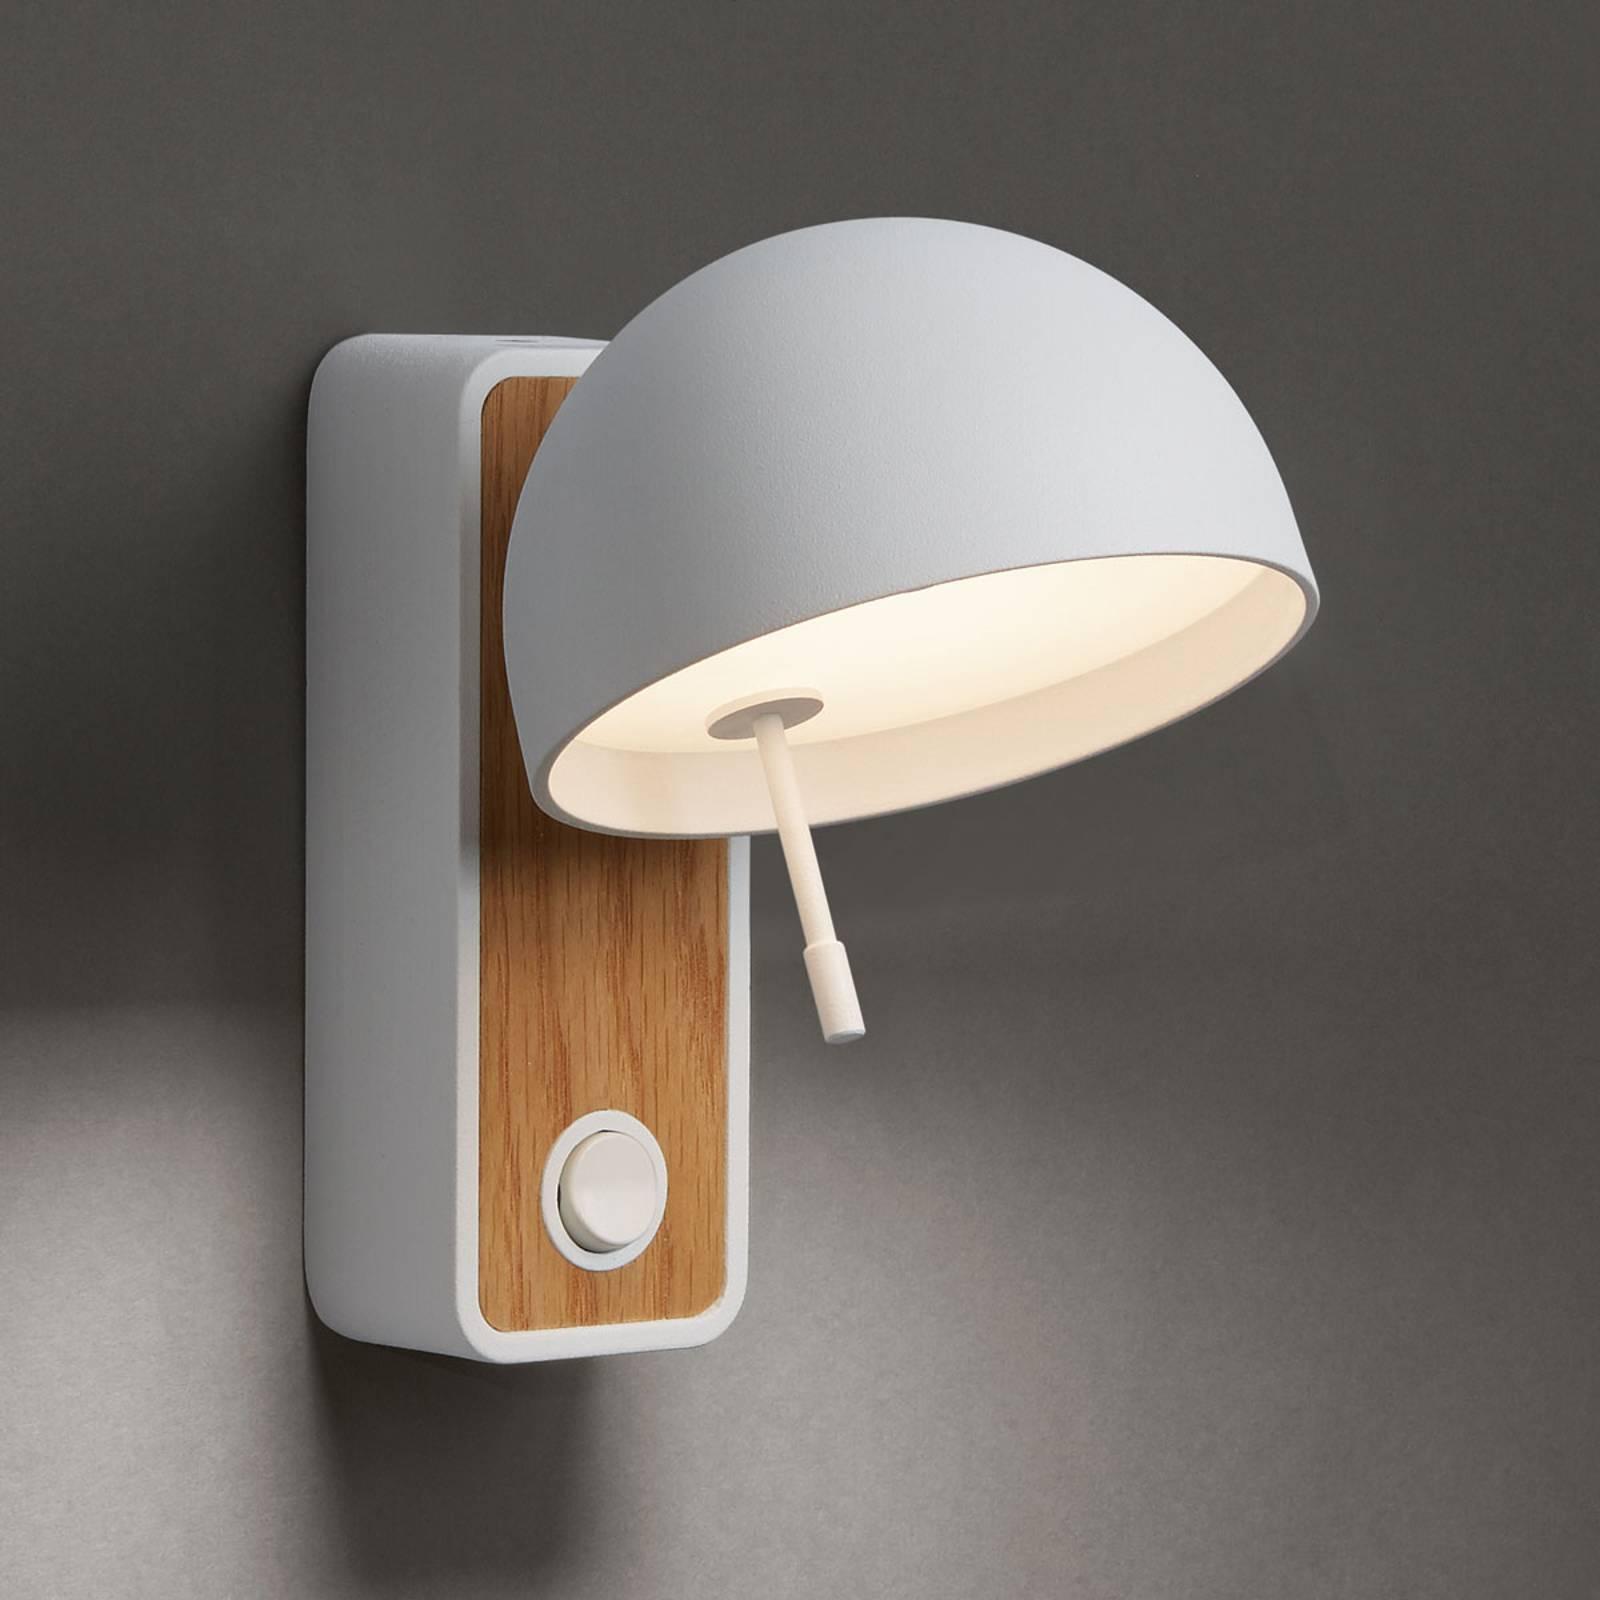 Bover Beddy A/01 applique LED rotatif blanc/chêne